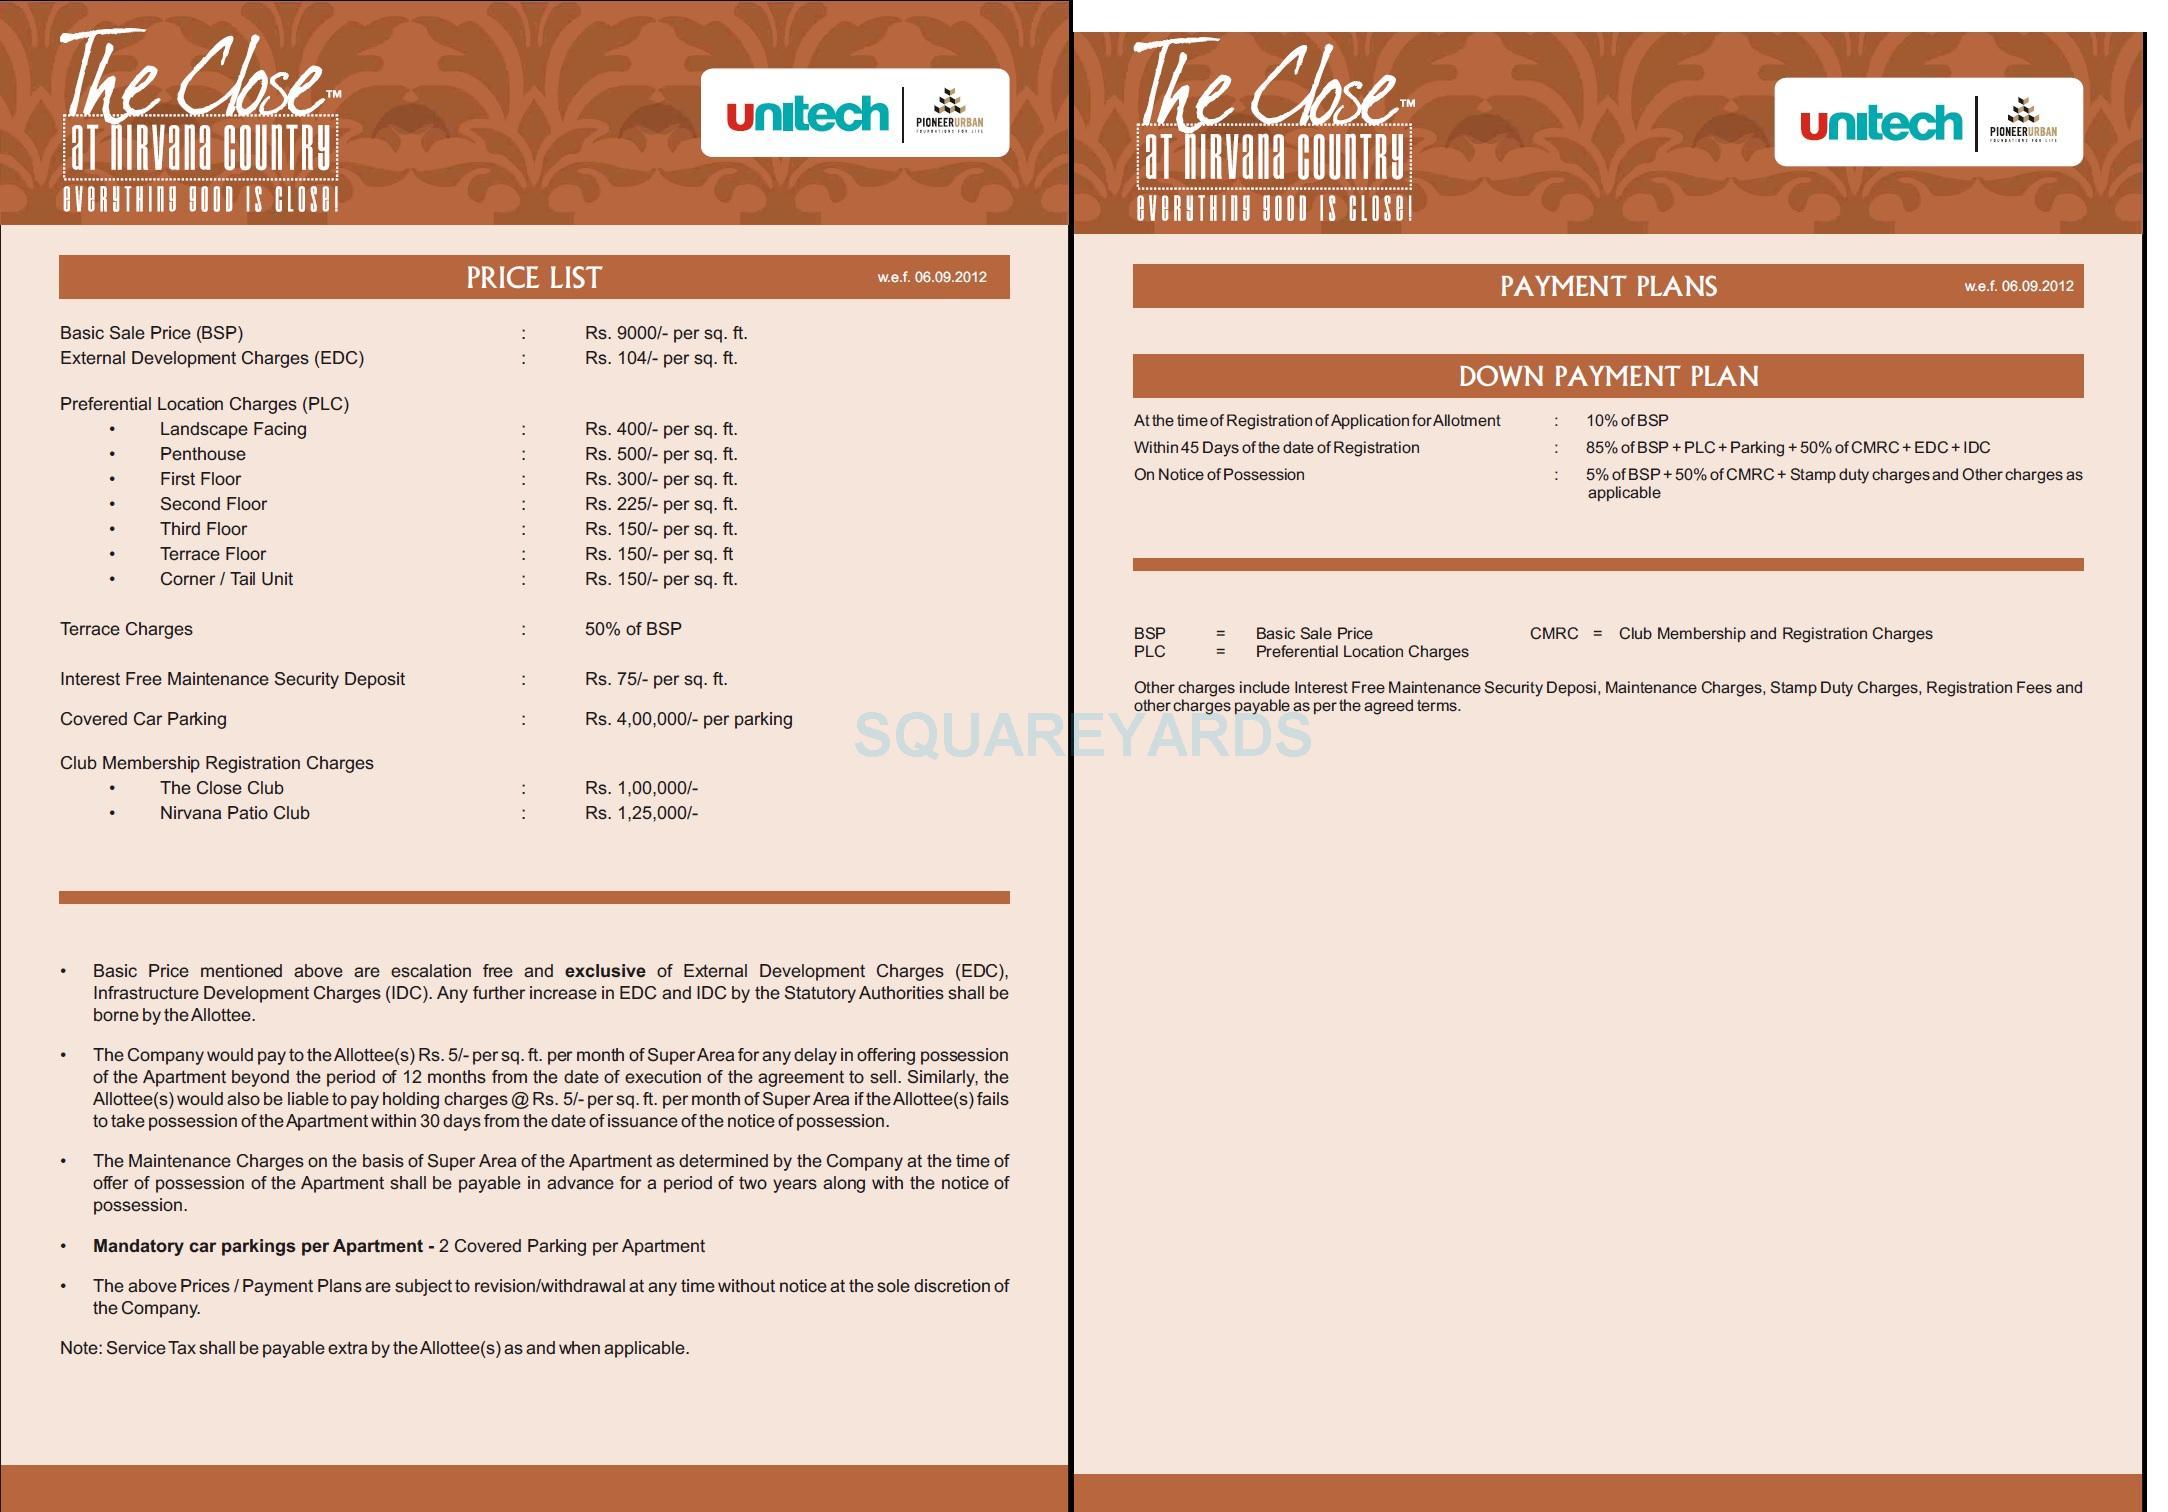 unitech the close north payment plan image1